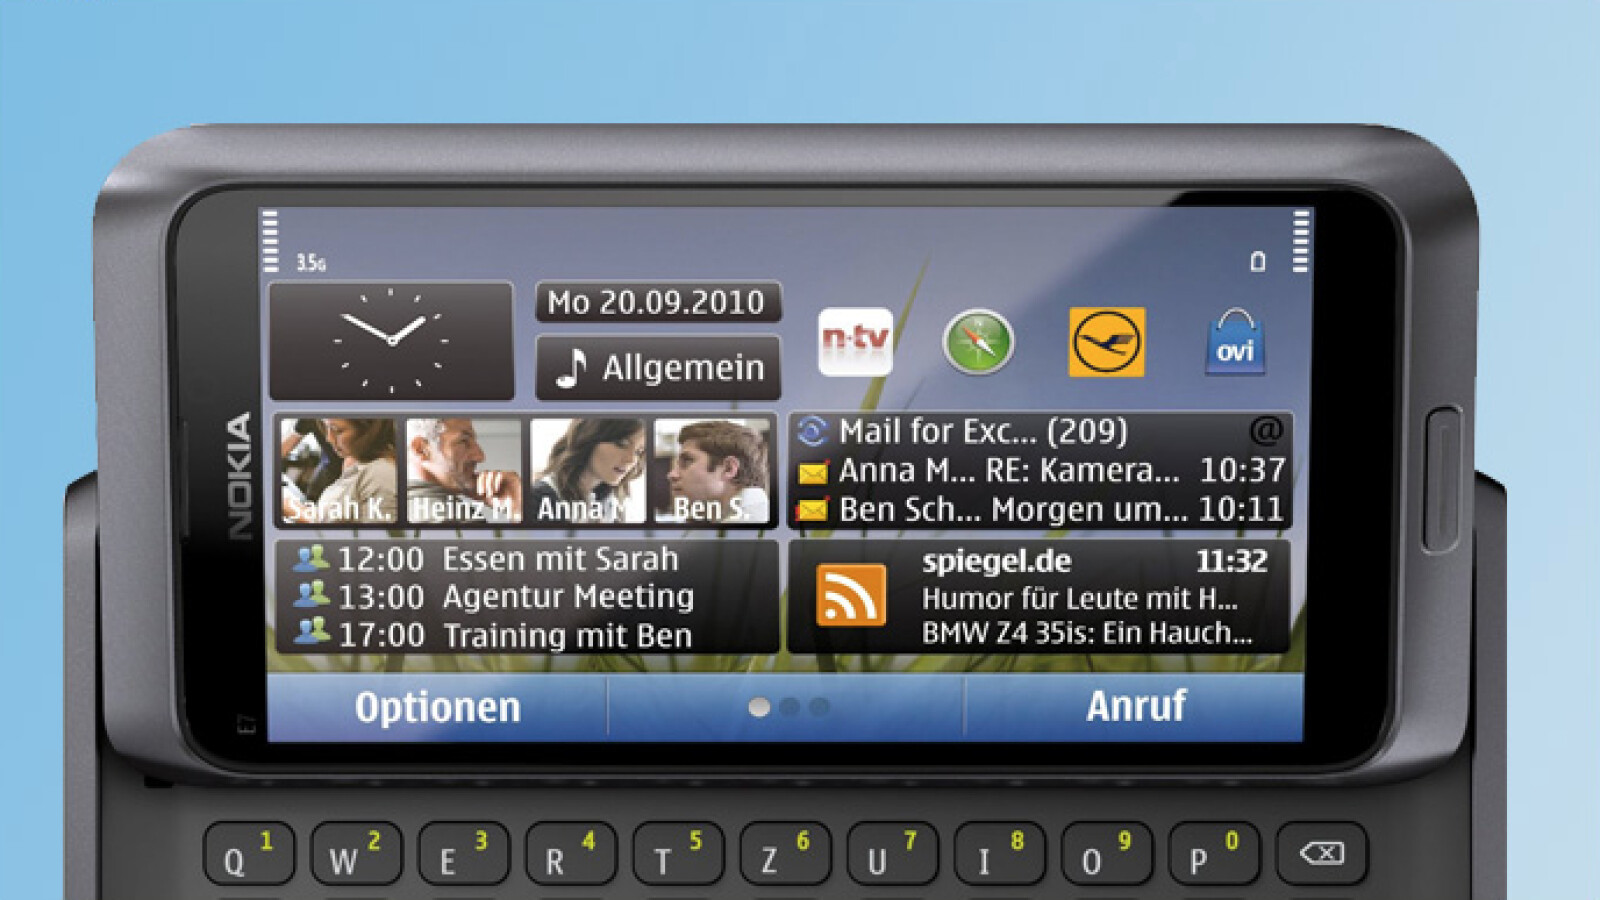 Nokia E7 Im Test Gelungener Multimedia Slider Netzwelt 130 Kamera New